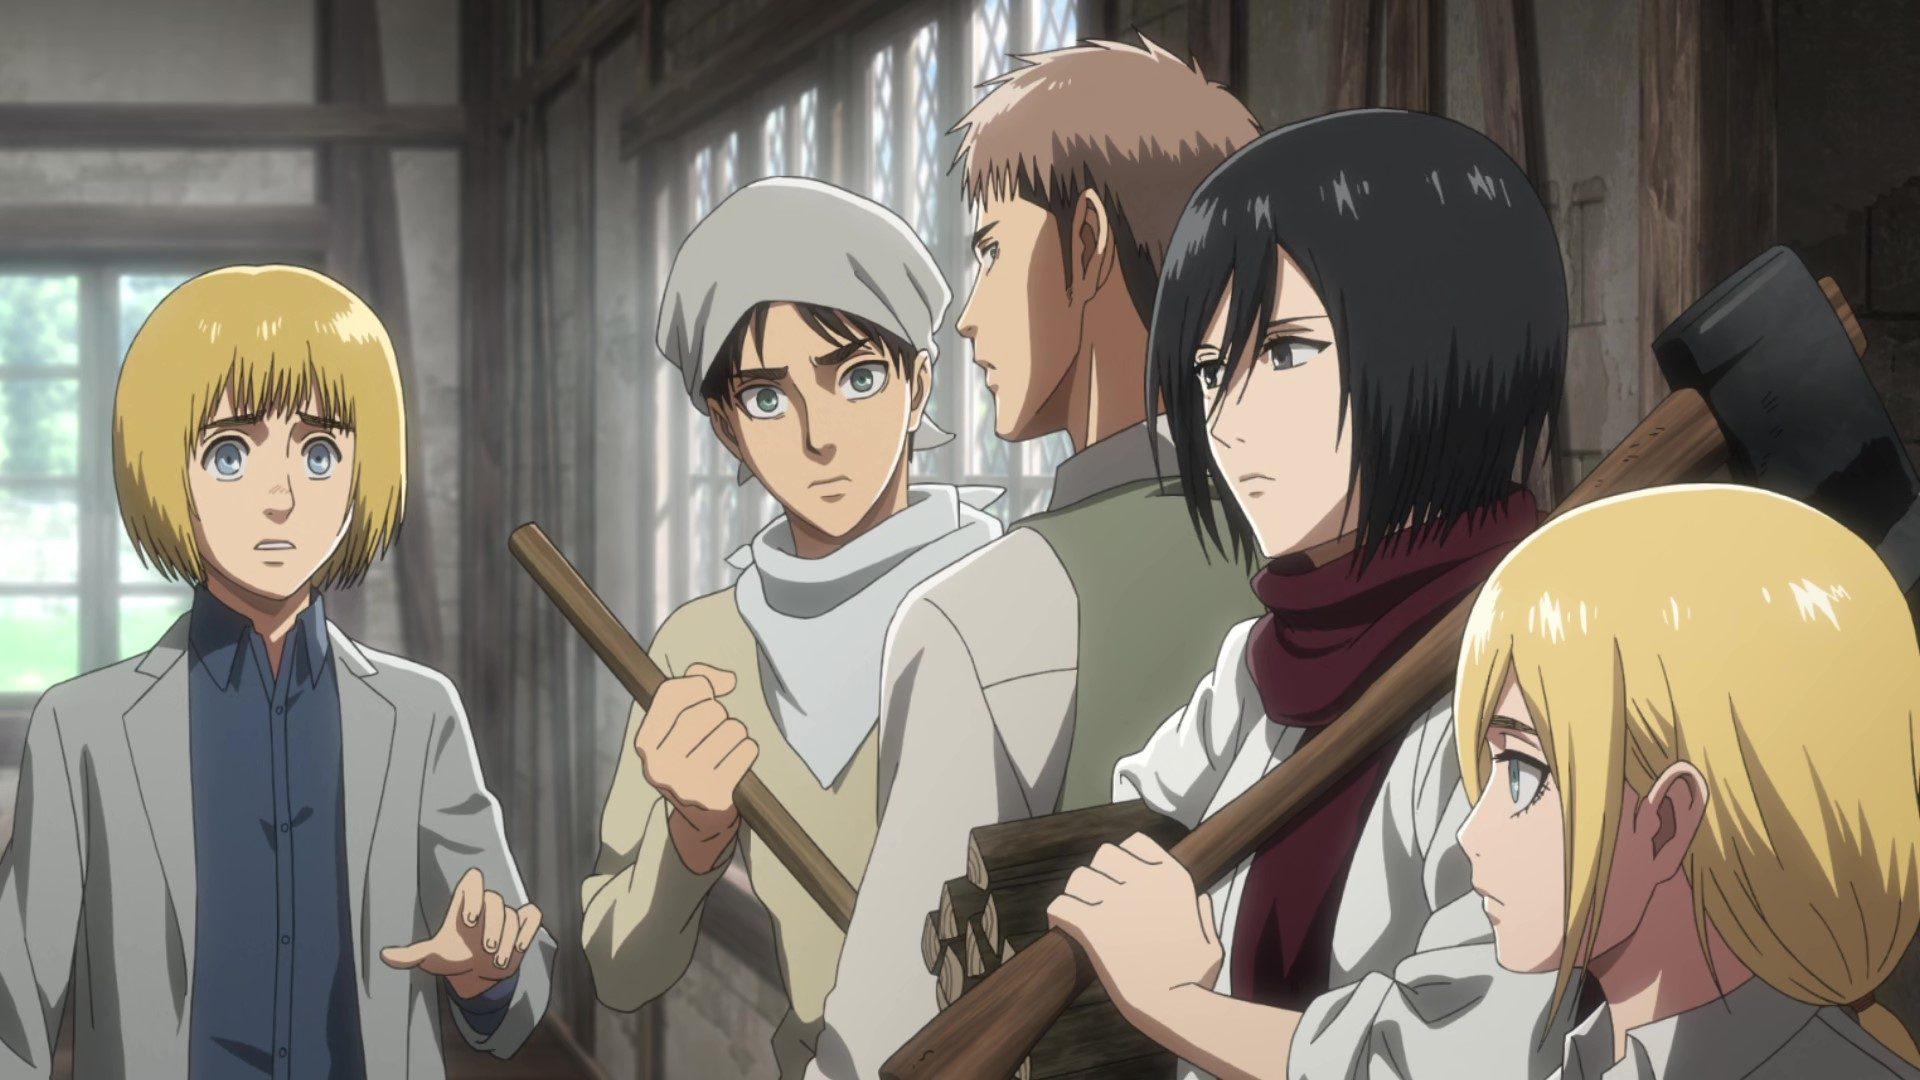 Attack on Titan Season 3 Episode 1 English Dubbed - AnimeGT